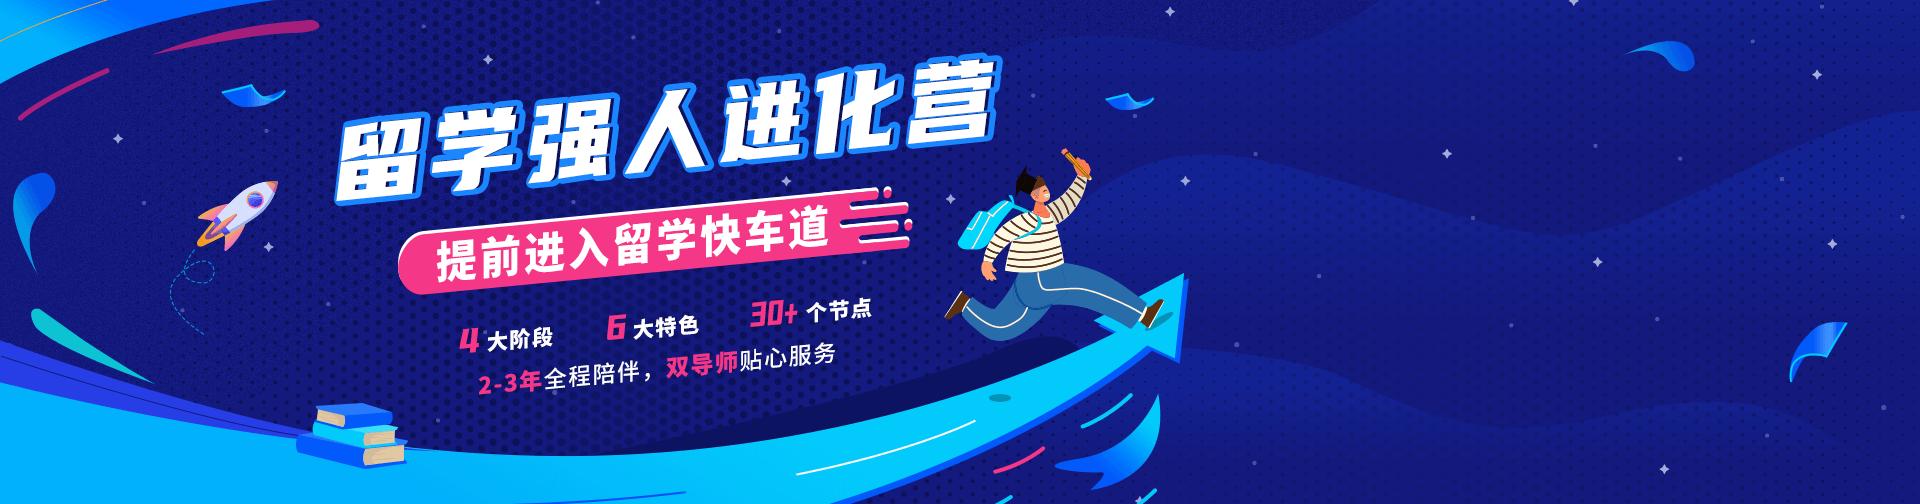 http://myoffer-public.oss-cn-shenzhen.aliyuncs.com/banners/bdc40b491027cebdd8bf285b64907f92-177697-1920x504.png